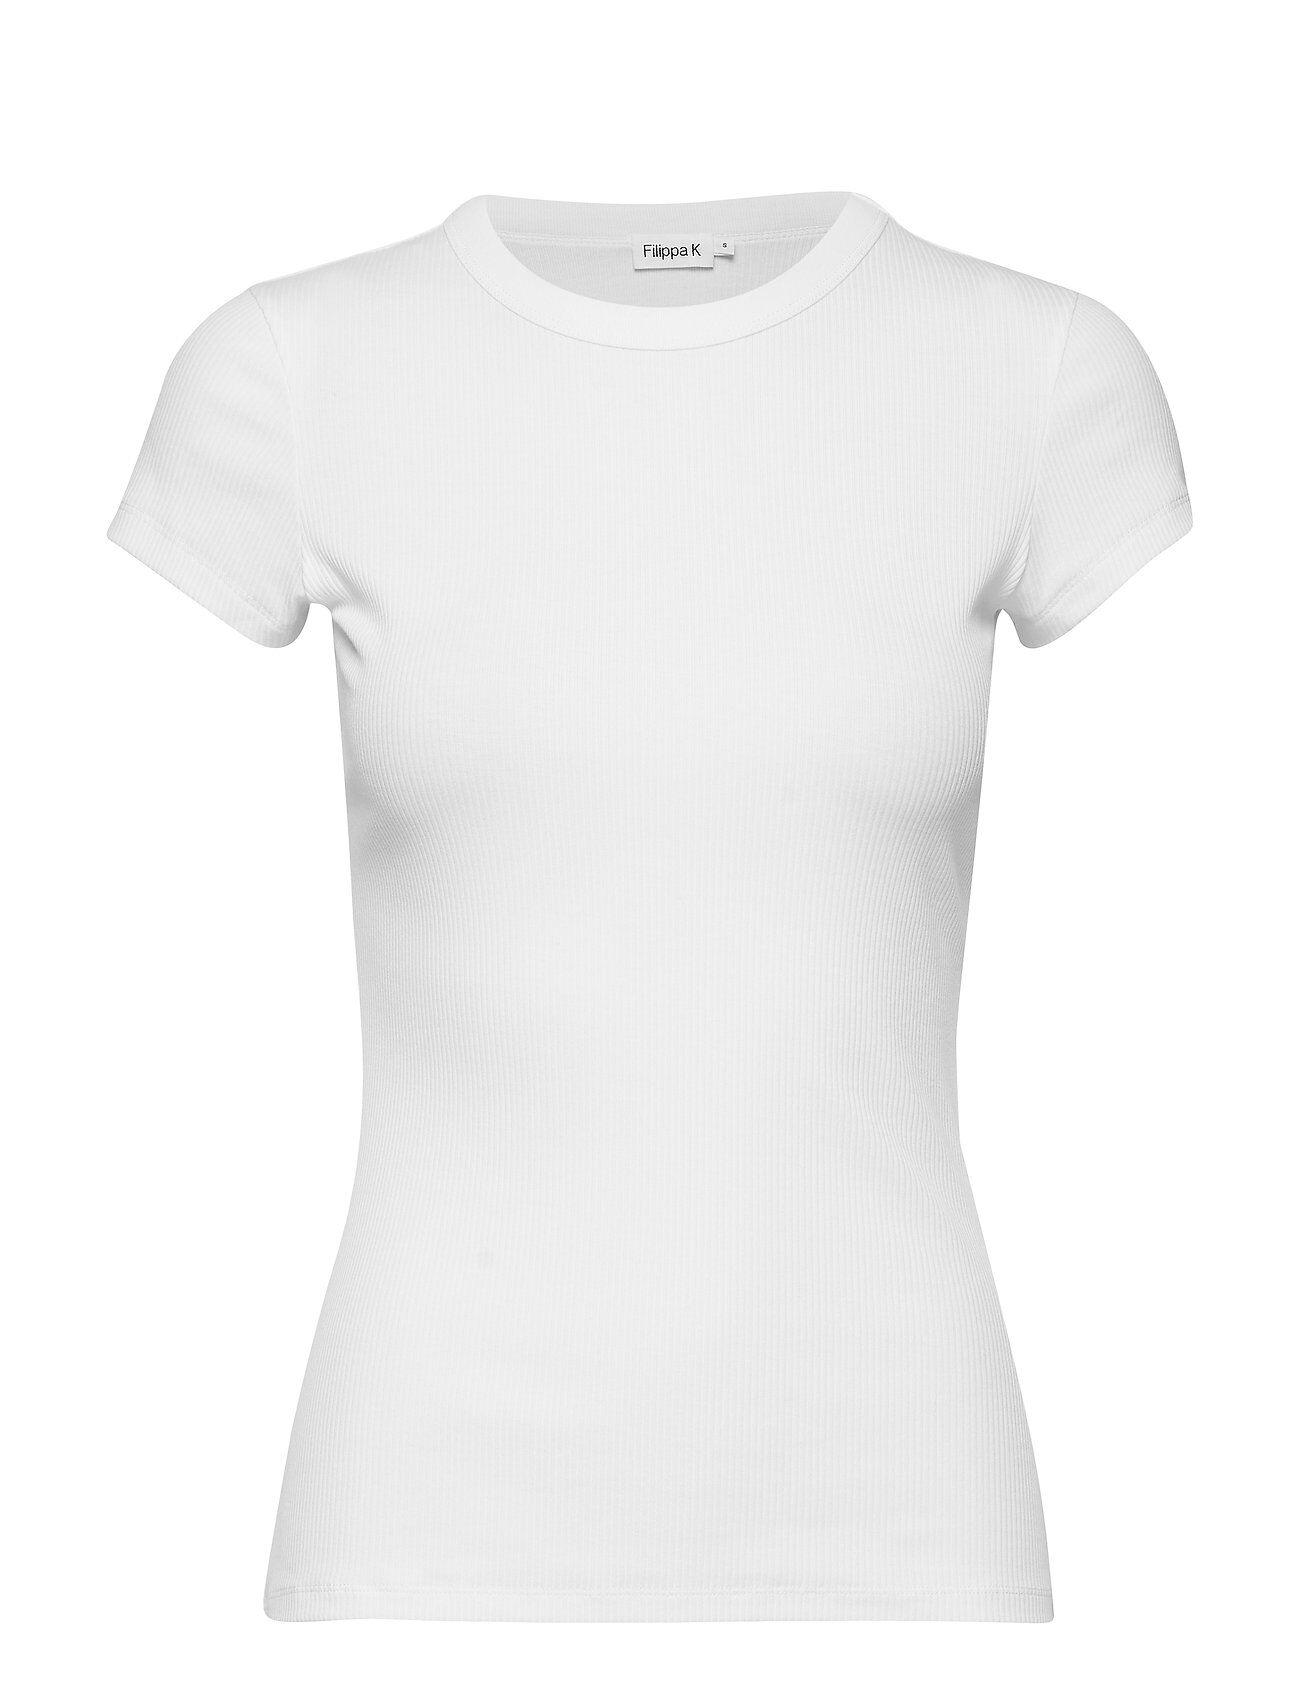 Filippa K Fine Rib Tee T-shirts & Tops Short-sleeved Valkoinen Filippa K